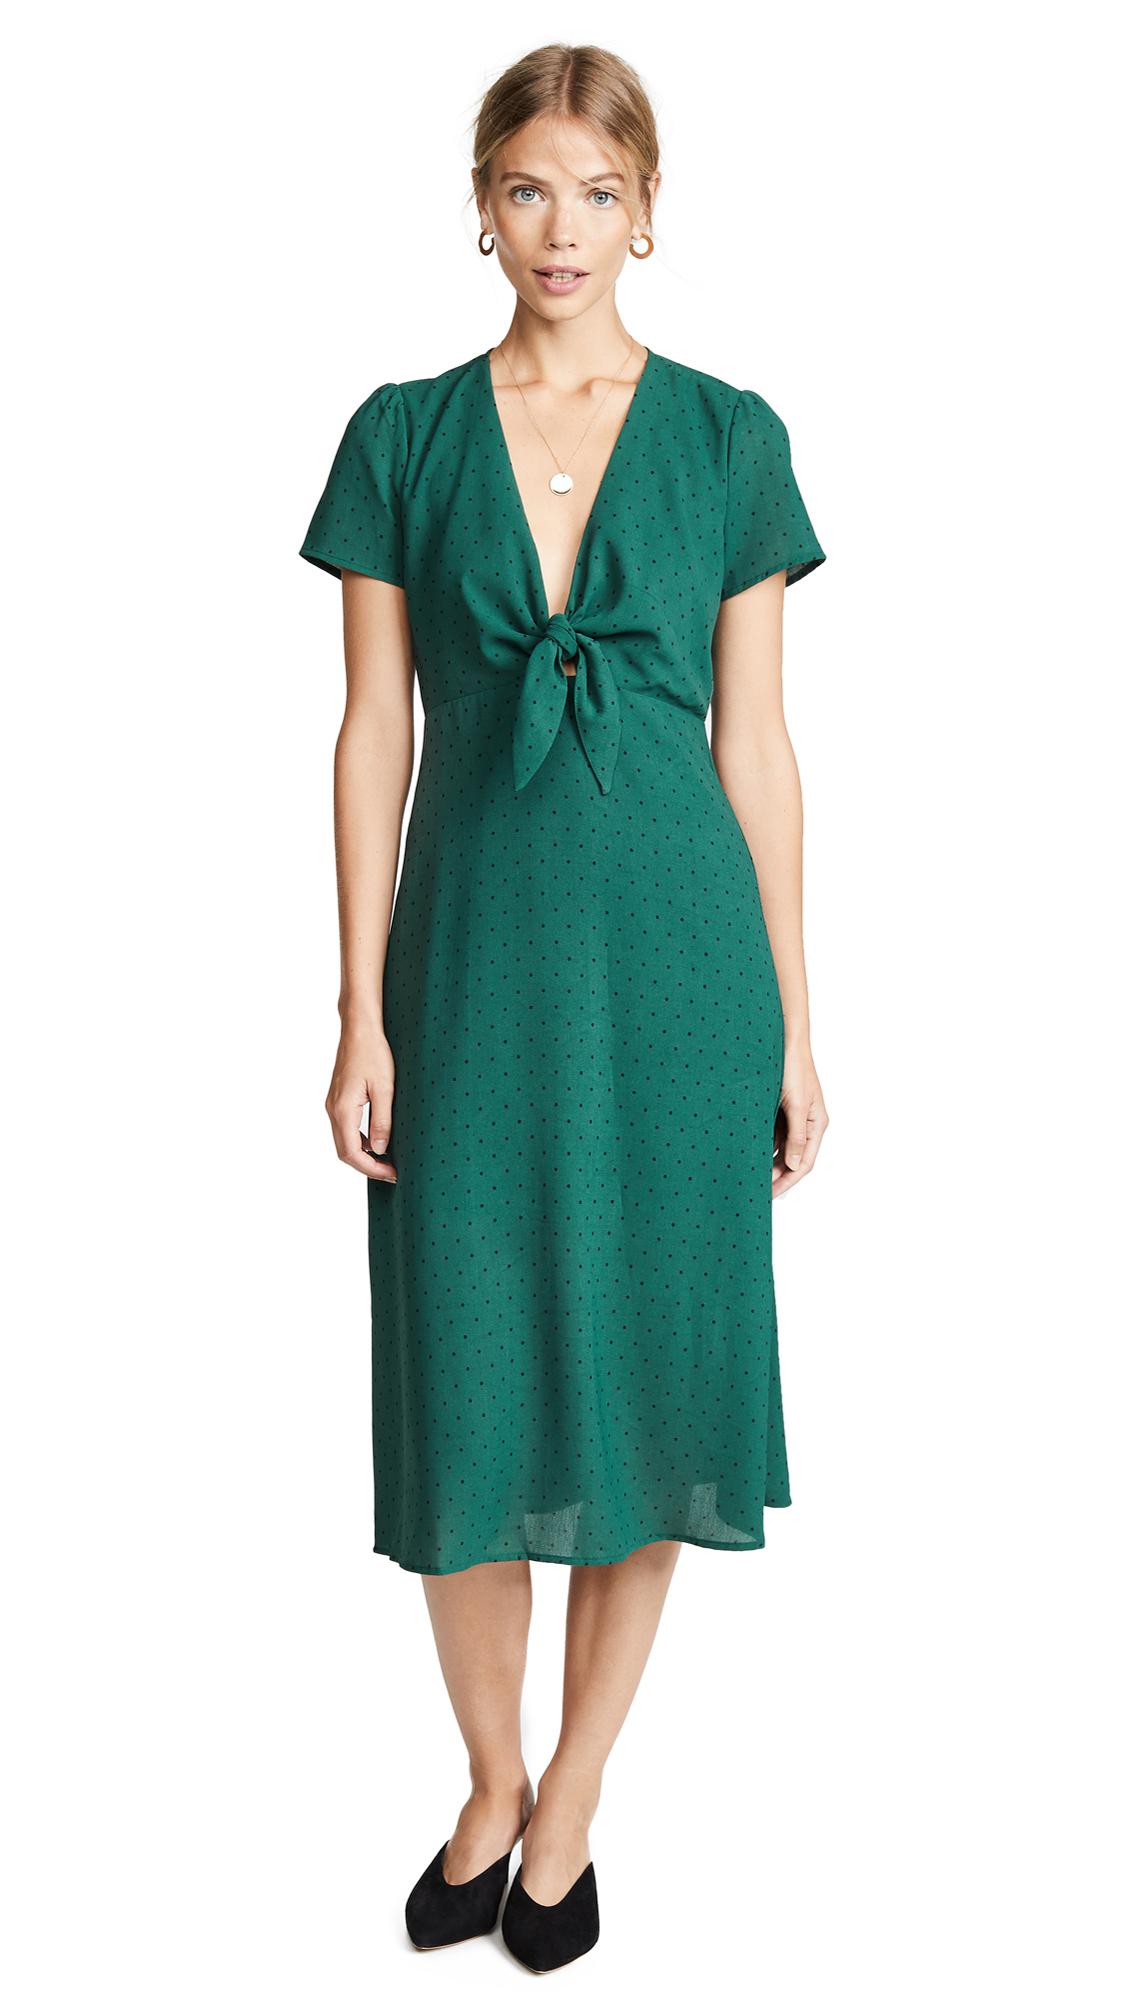 RE:NAMED Re: Named Polka Dot Dress in Hunter